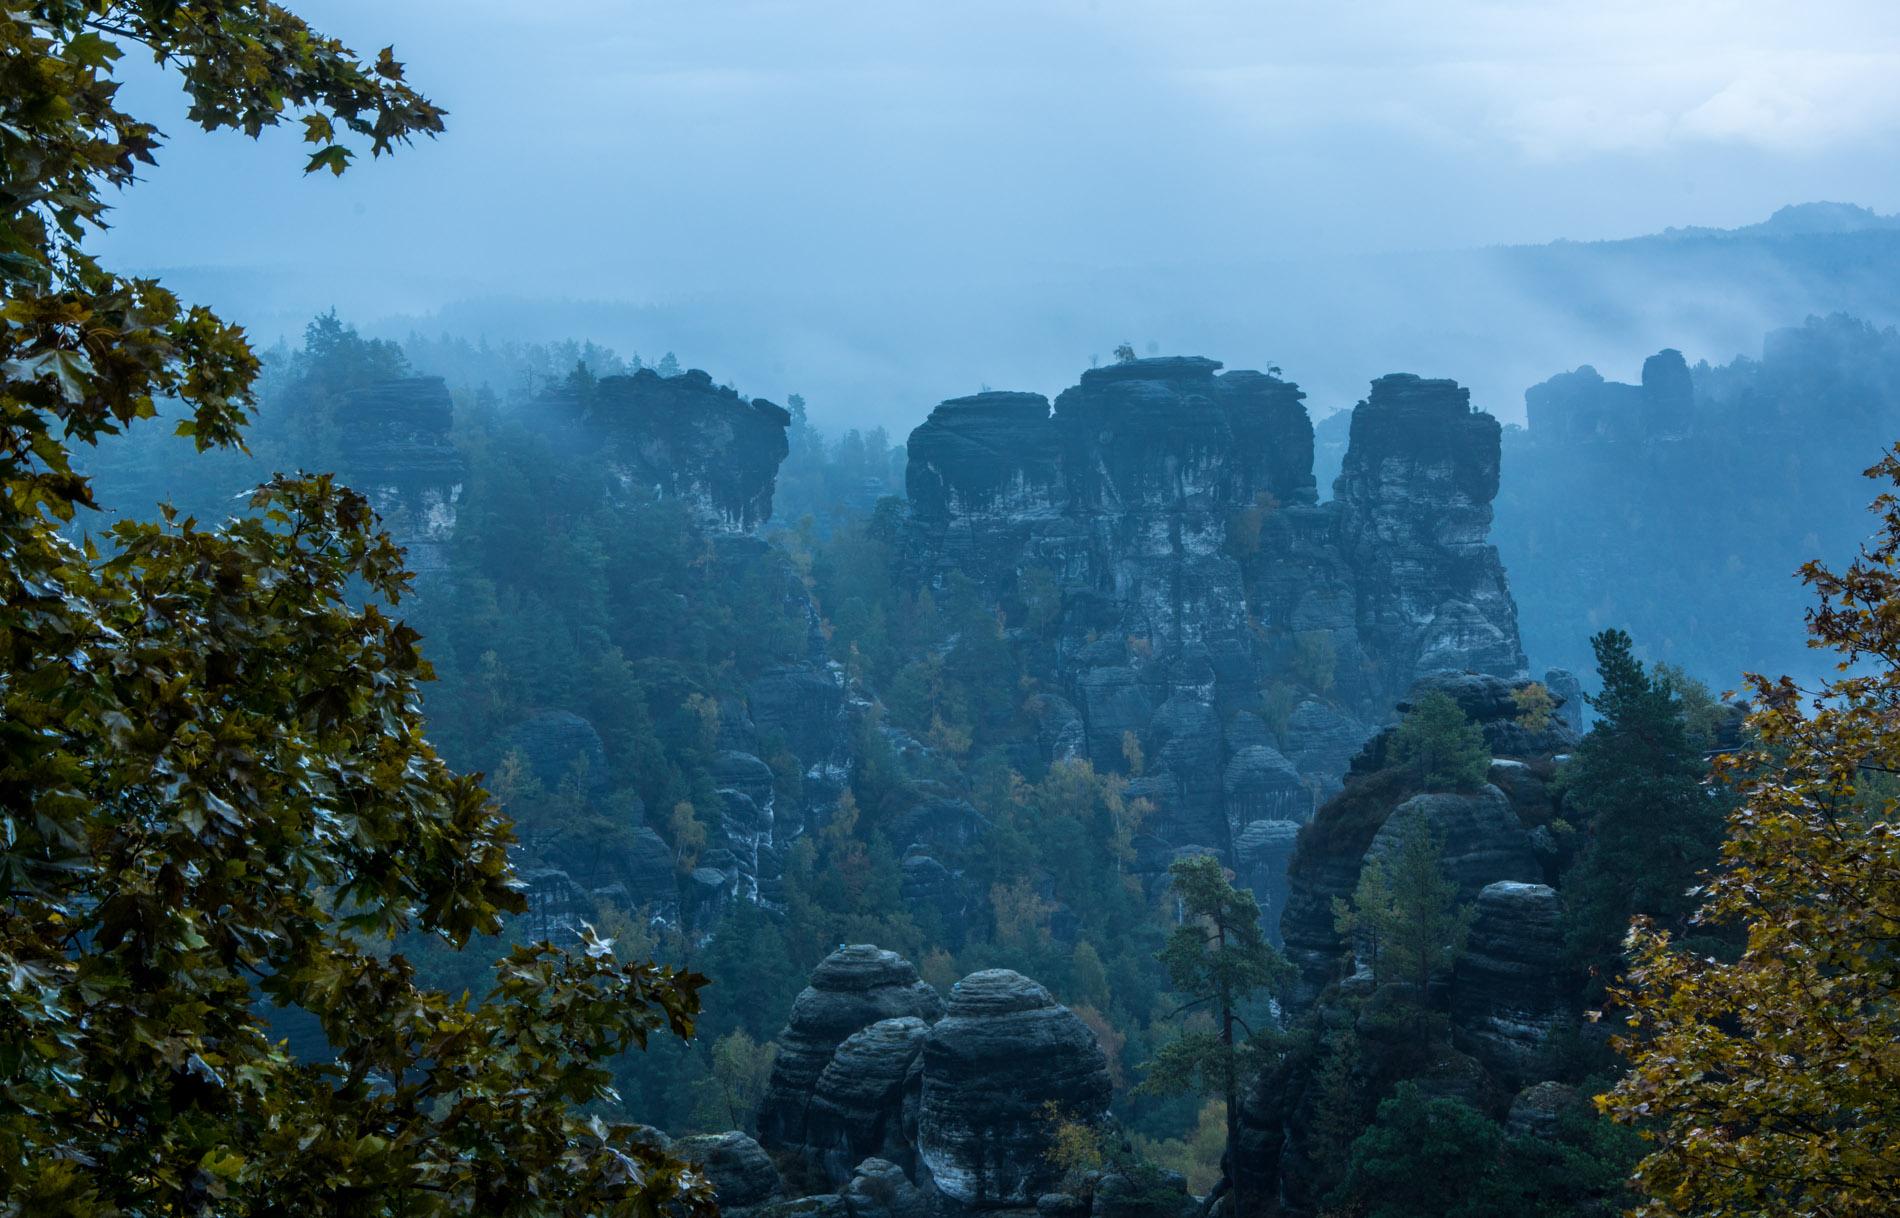 Malerisches Elbsandsteingebirge